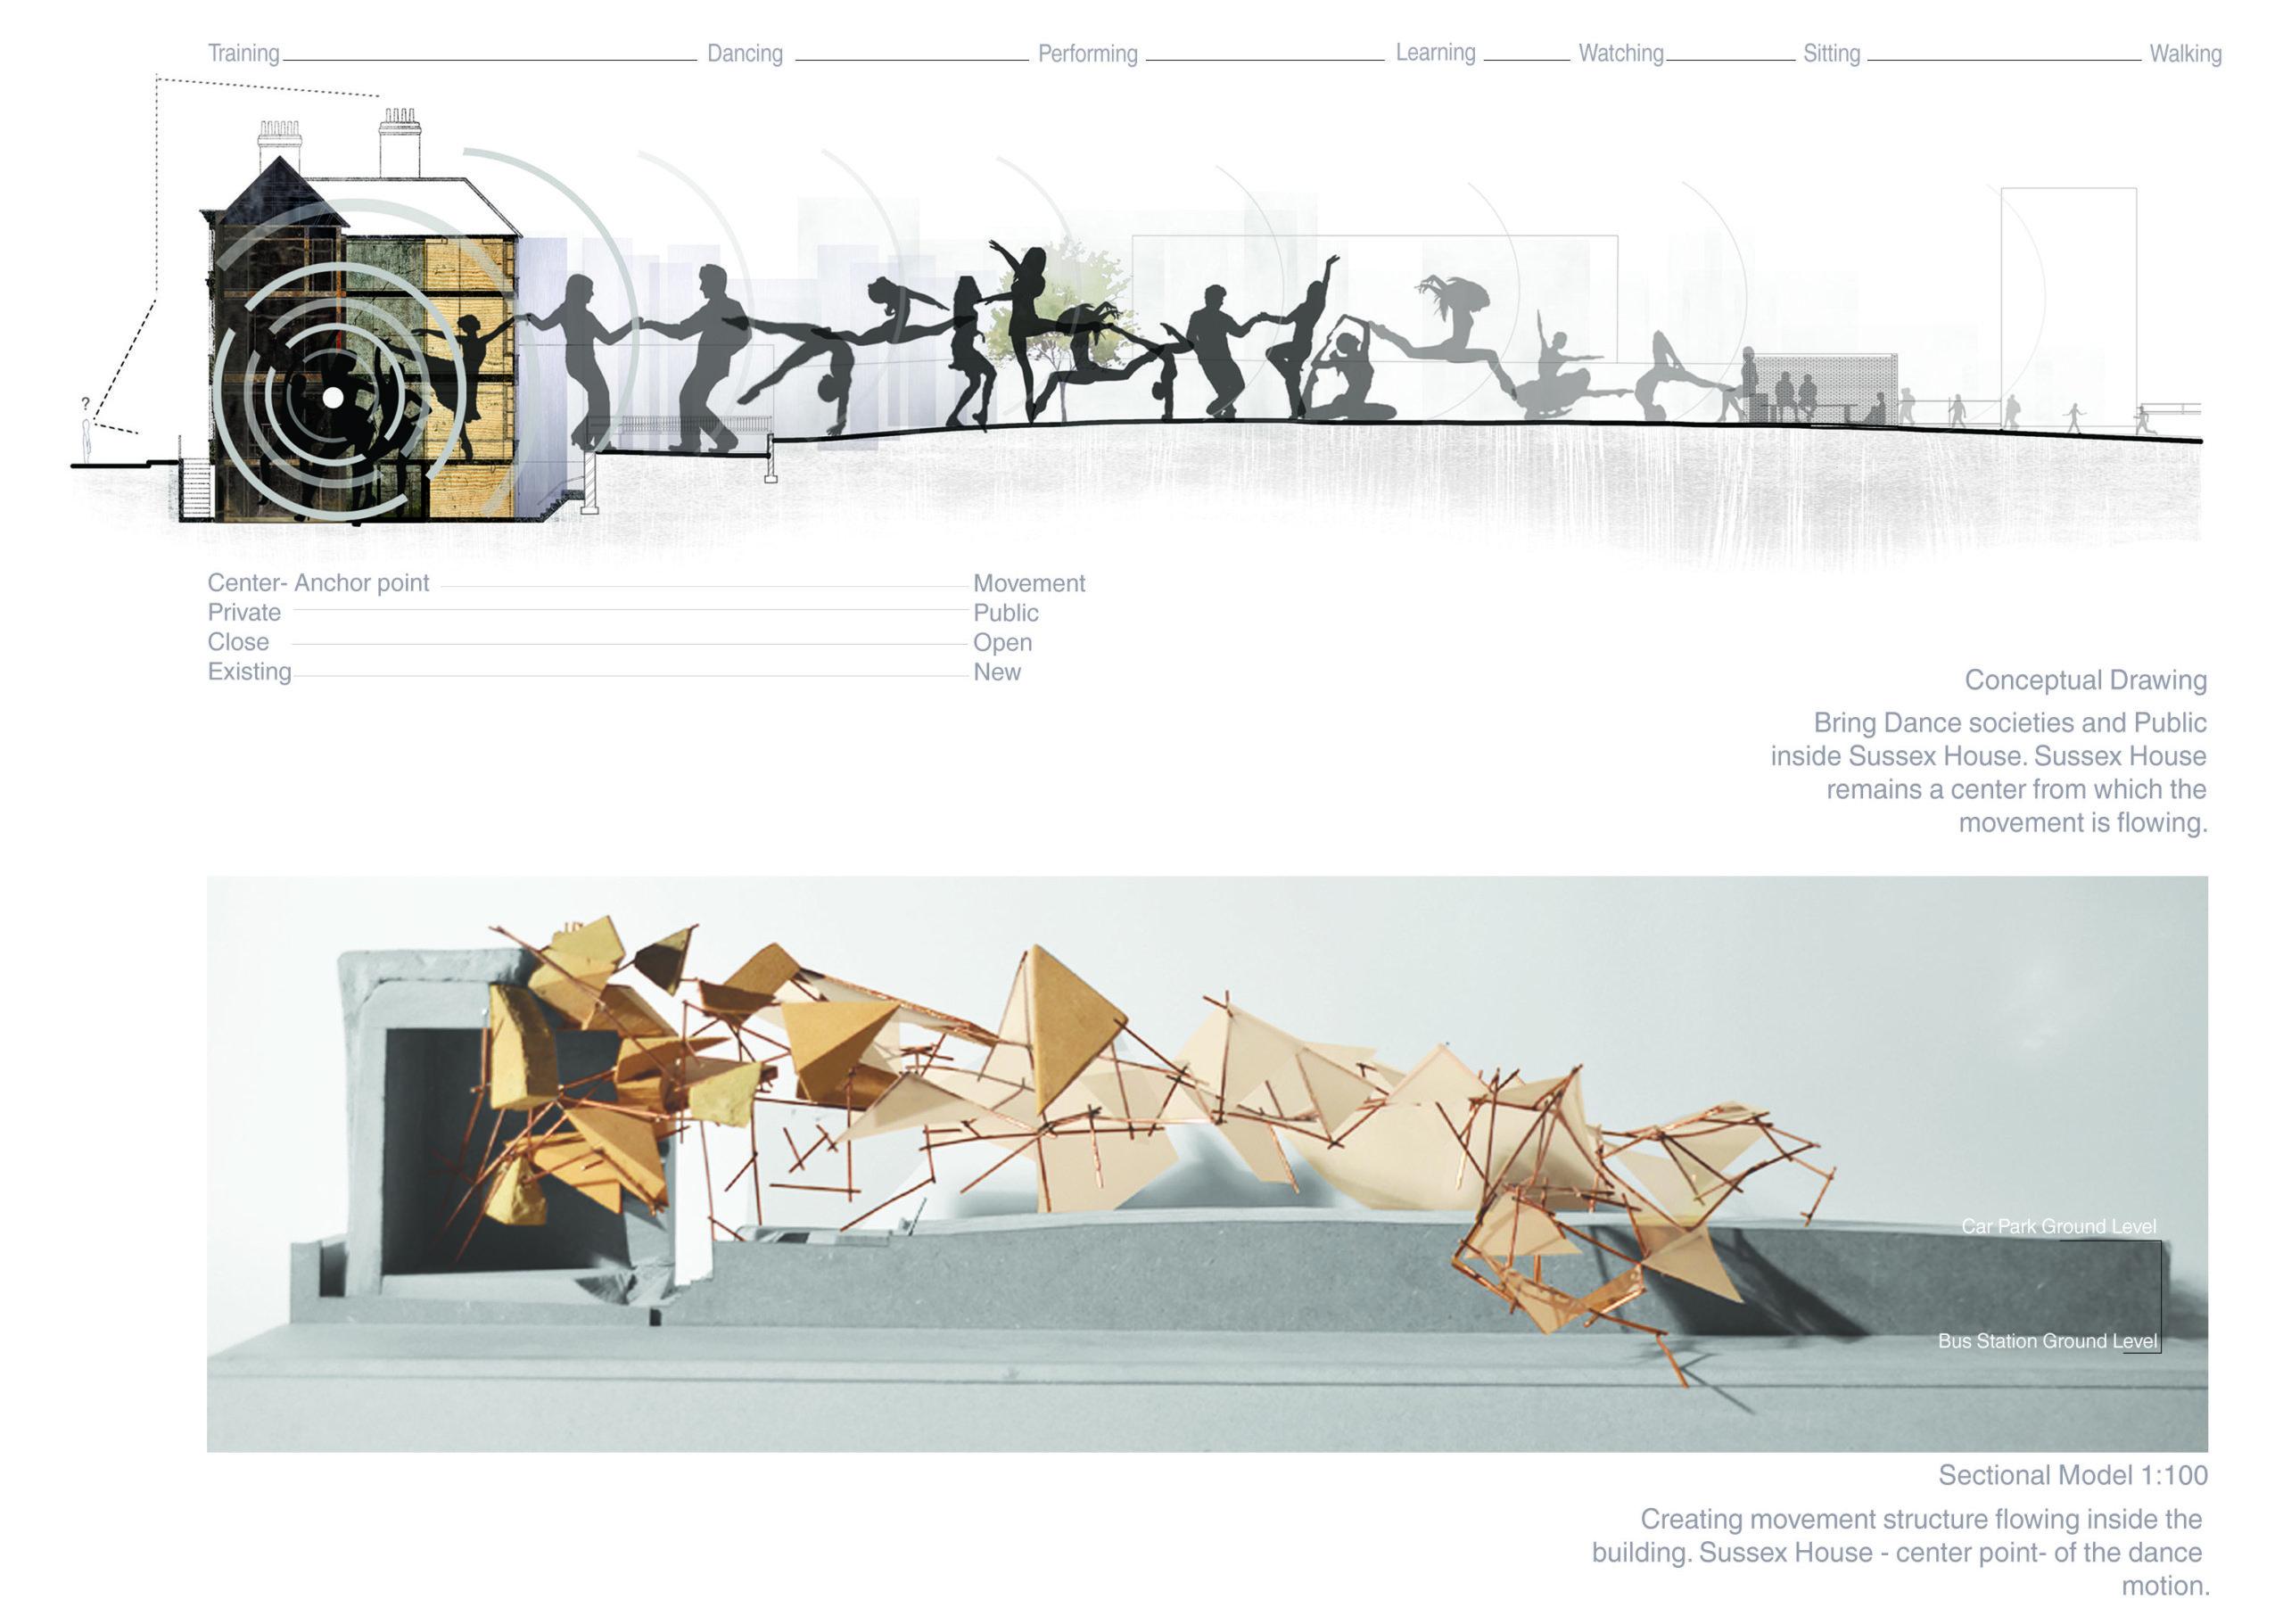 ana_sidorova technology-Dance Theatre Lewes town (17)